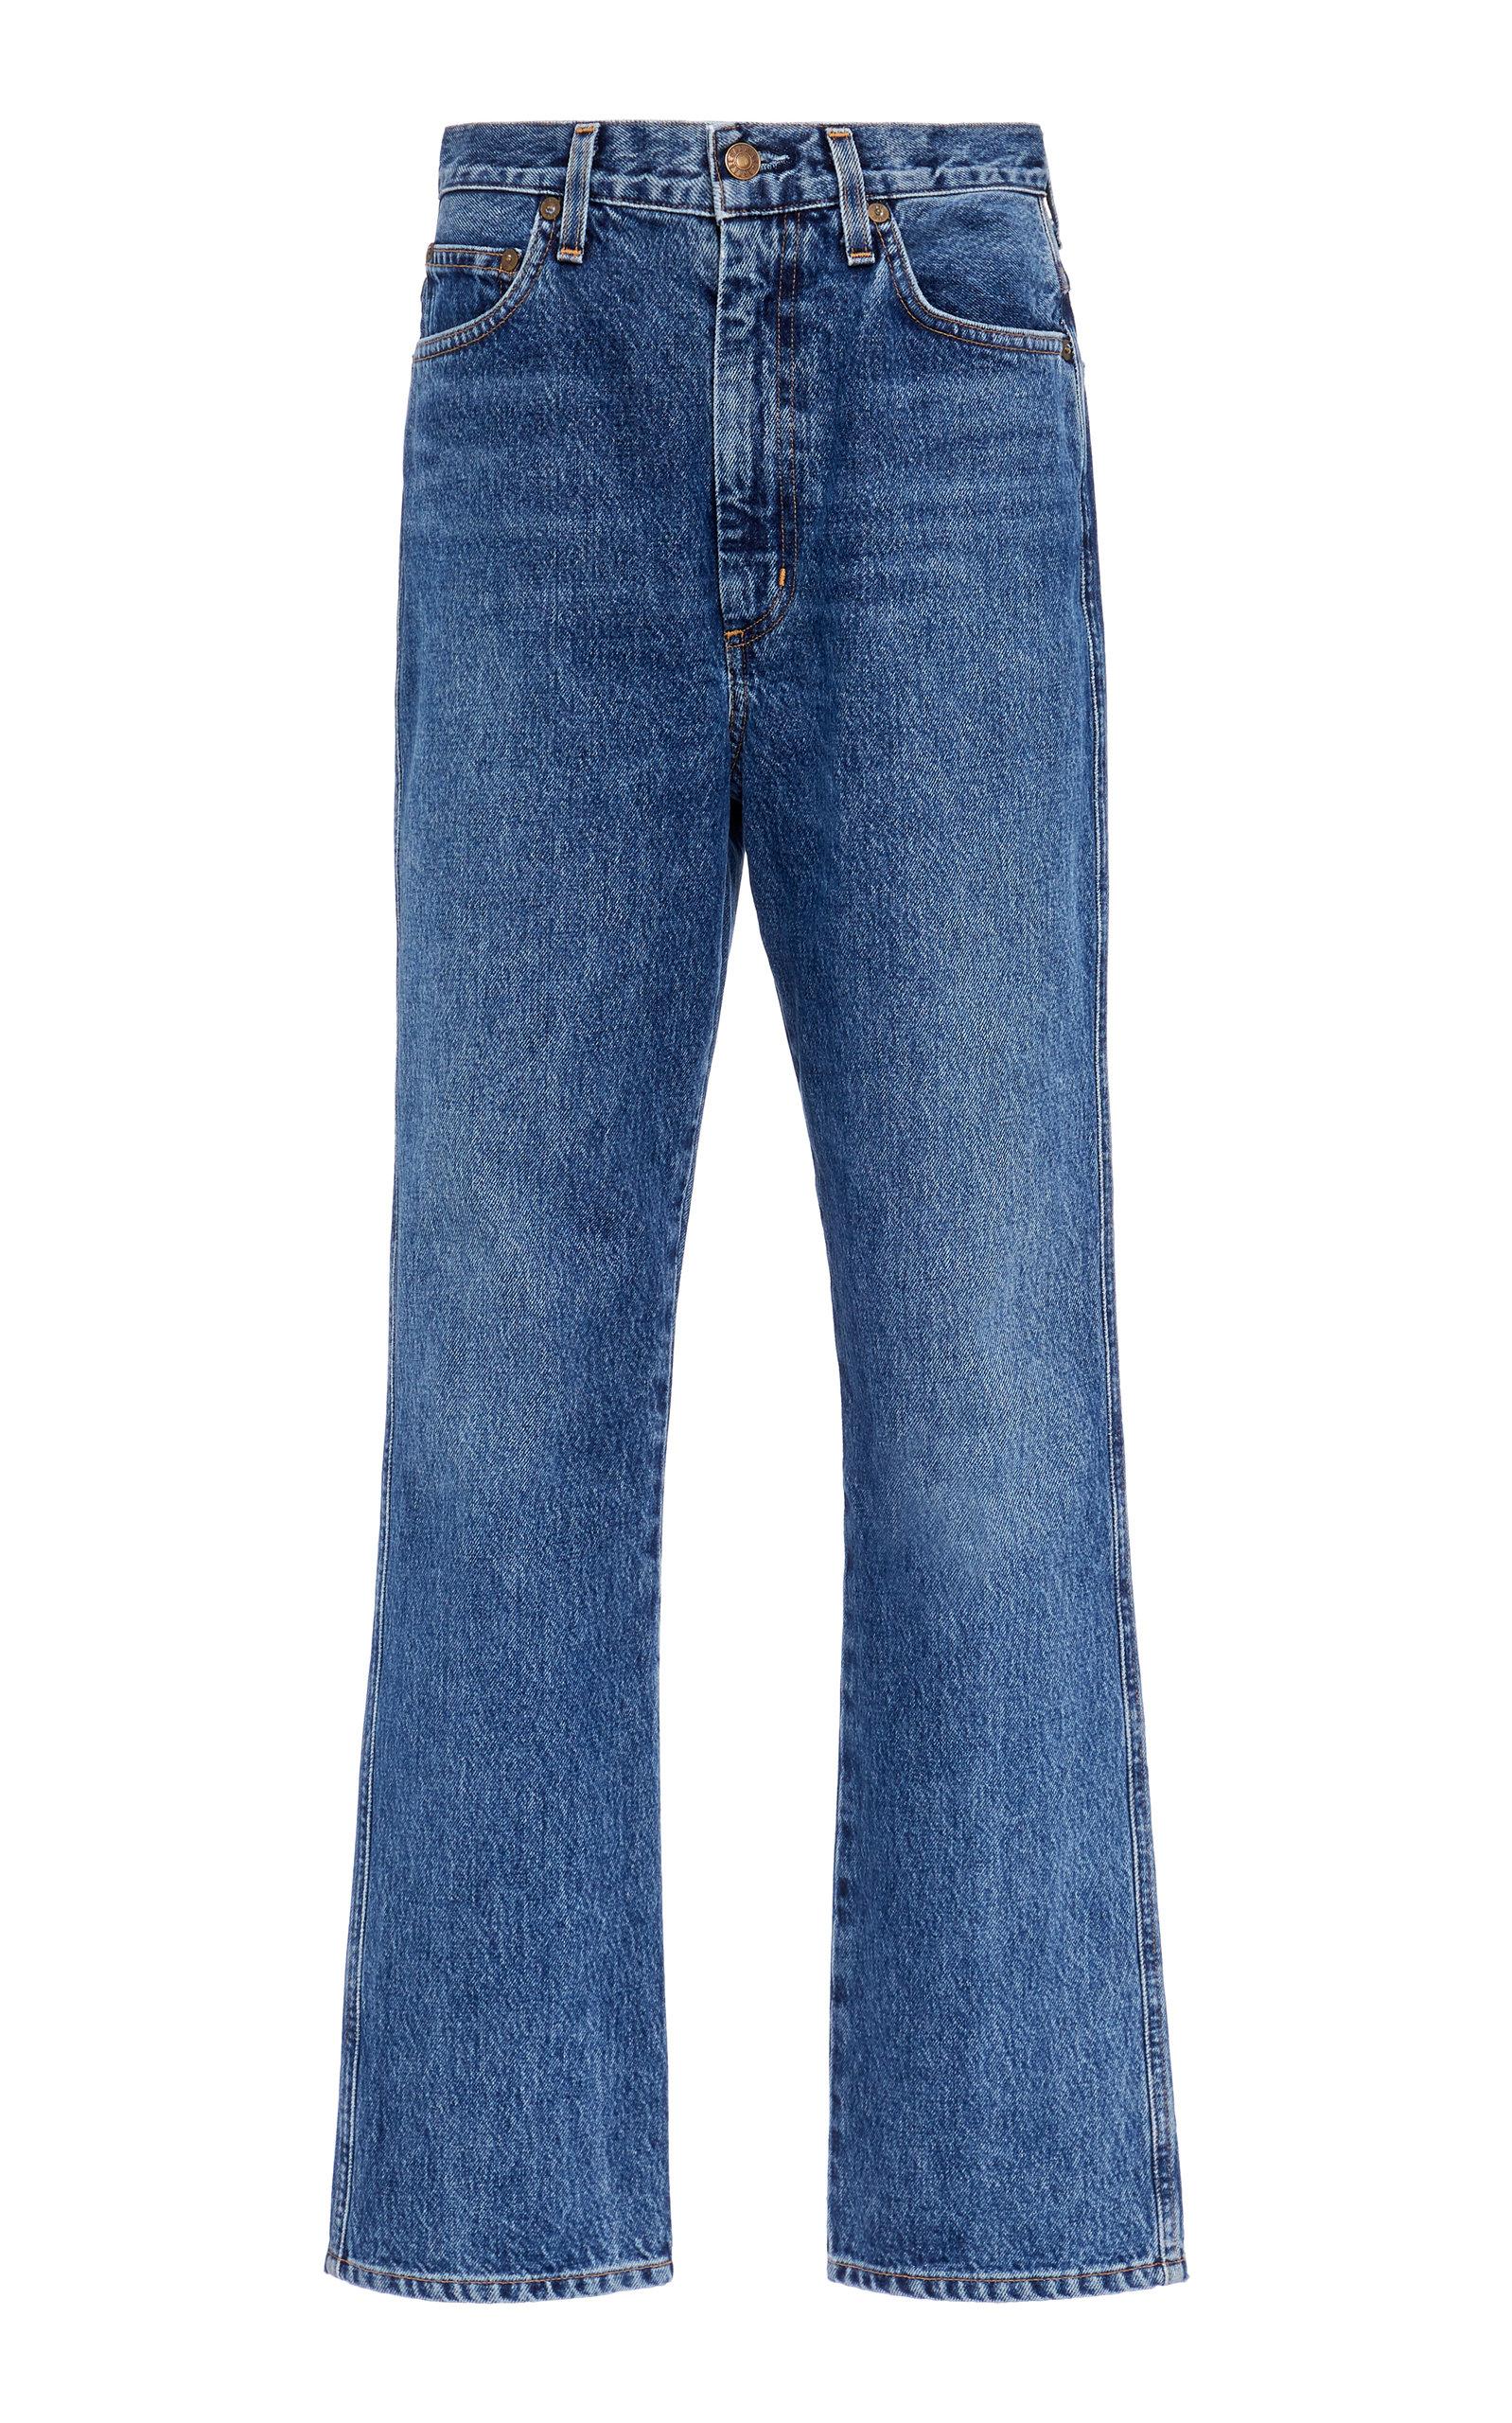 Agolde - Women's Pinch-Waist Rigid High-Rise Kick-Leg Jeans - Medium Wash - Moda Operandi